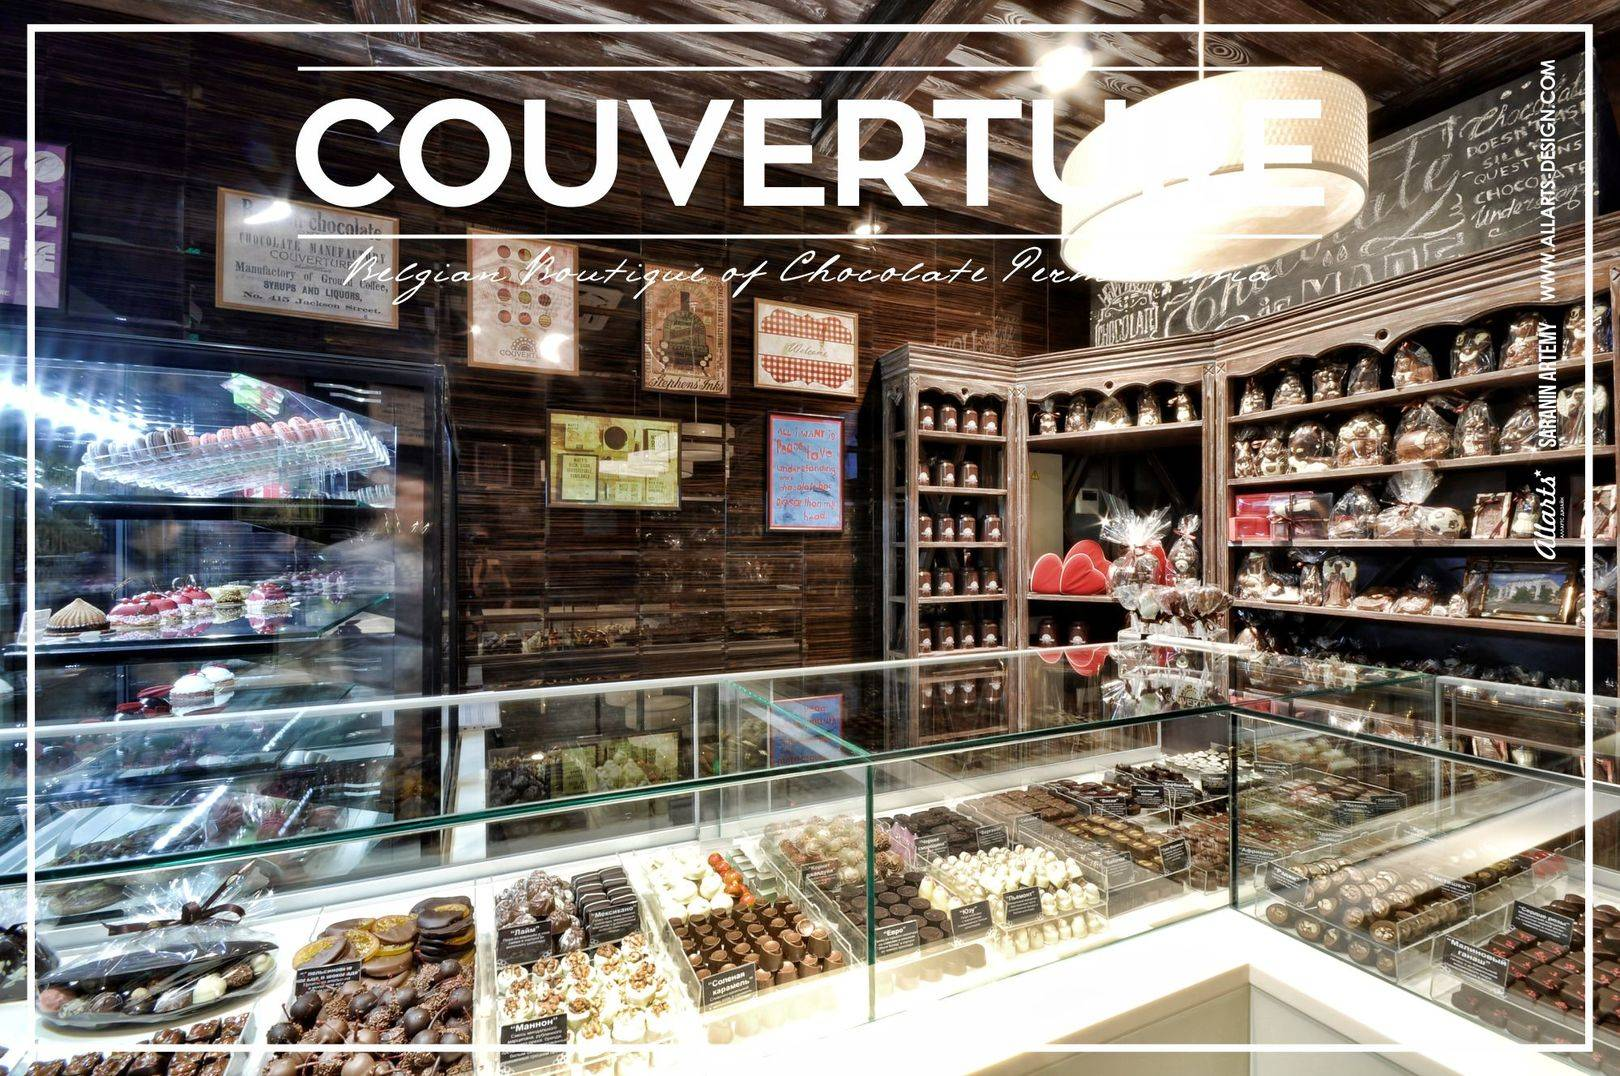 Дизайн интерьера магазина шоколада Couverture